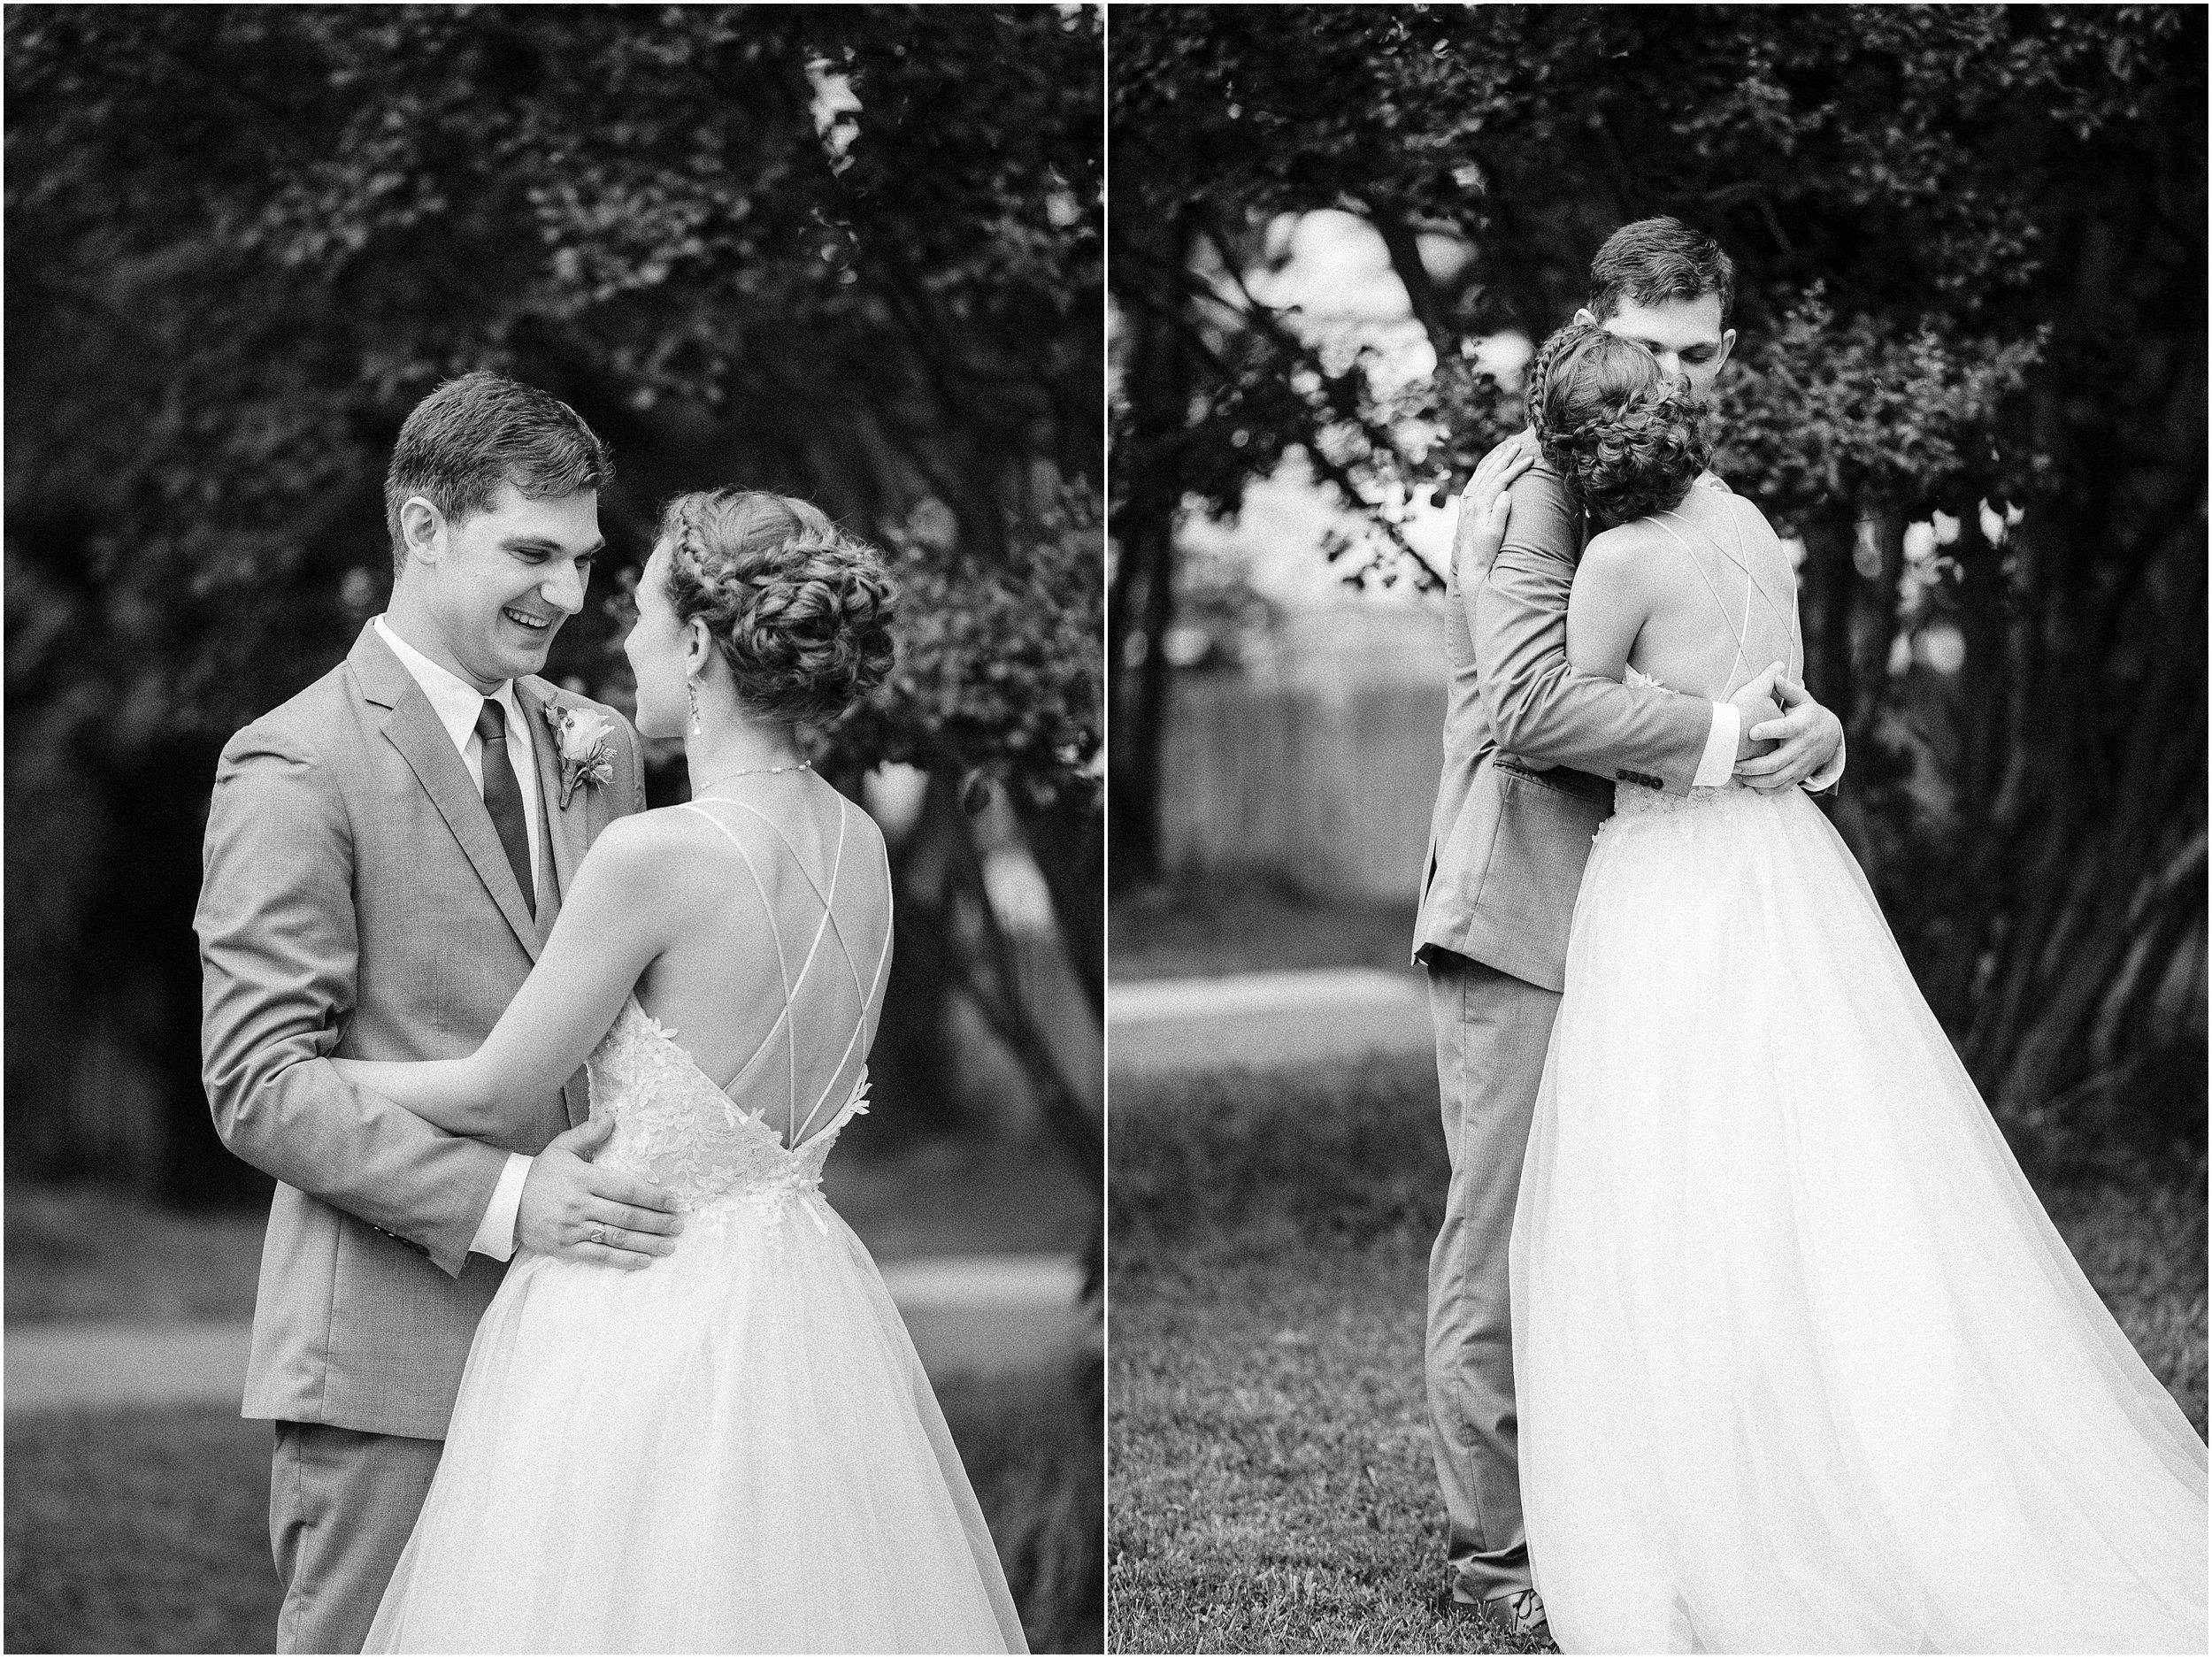 hannah leigh photography Cylburn Arboretum Wedding Baltimore, MD_3405.jpg